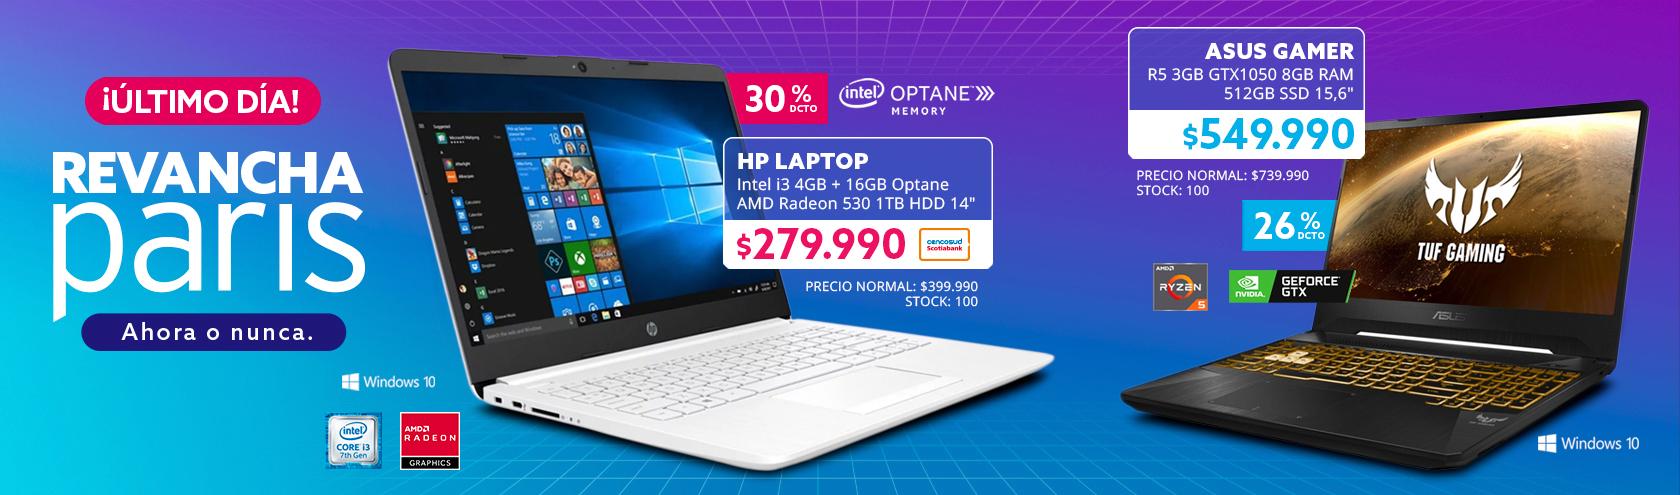 Notebook HP Laptop Intel i3 4GB + 16GB Optane AMD Radeon 530 1TB HDD 14 a $279.990 con Tarjeta Cencosud